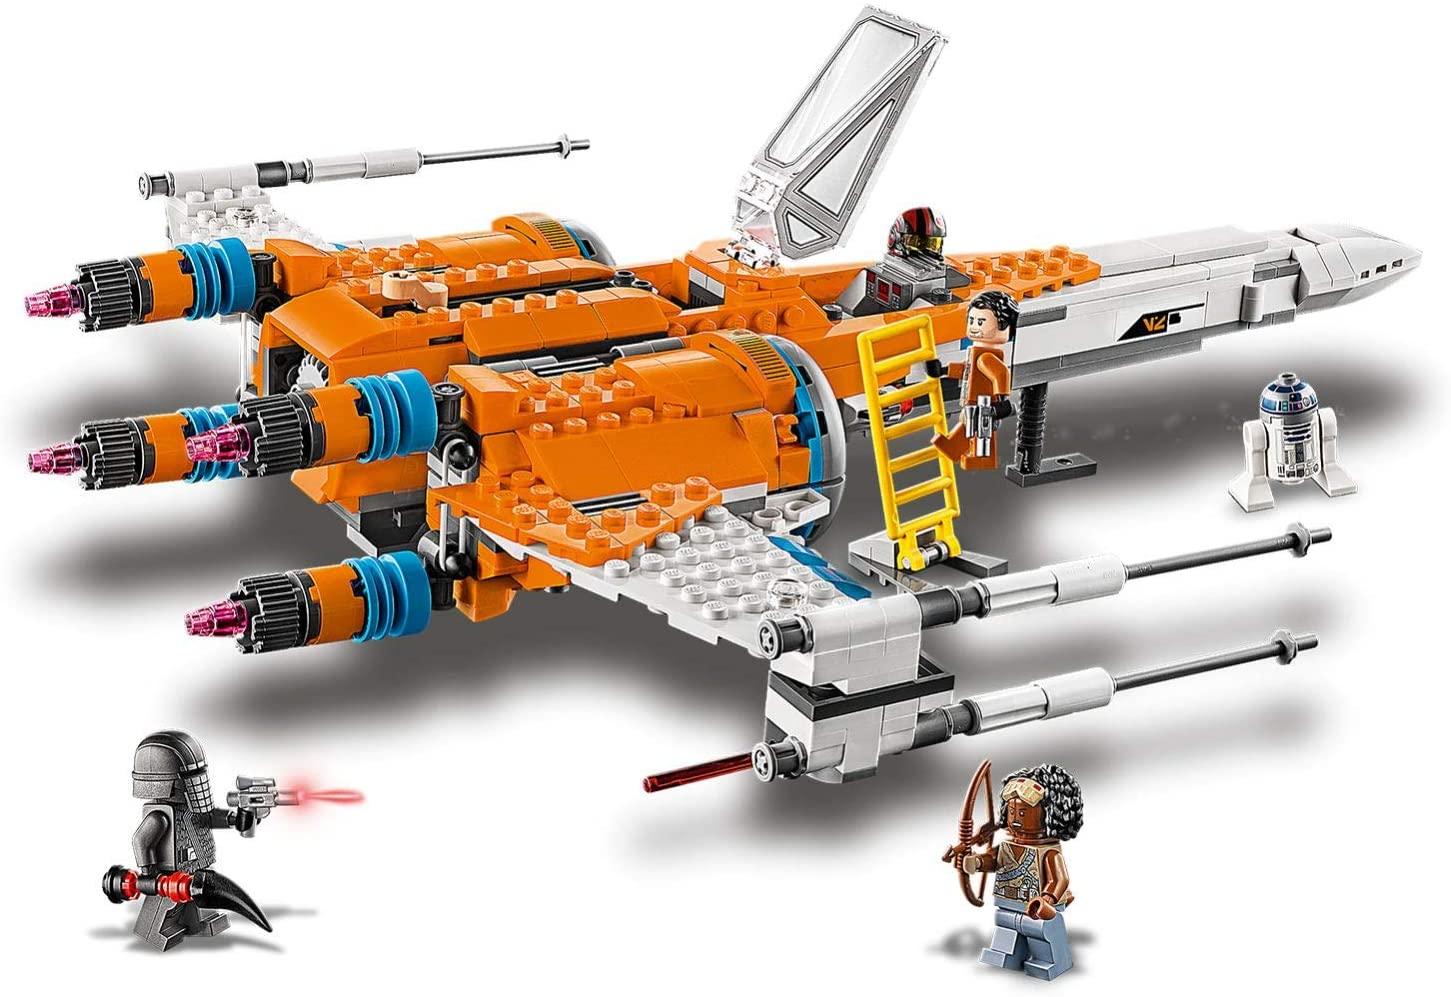 LEGO Star Wars Le chasseur X-wing de Poe Dameron